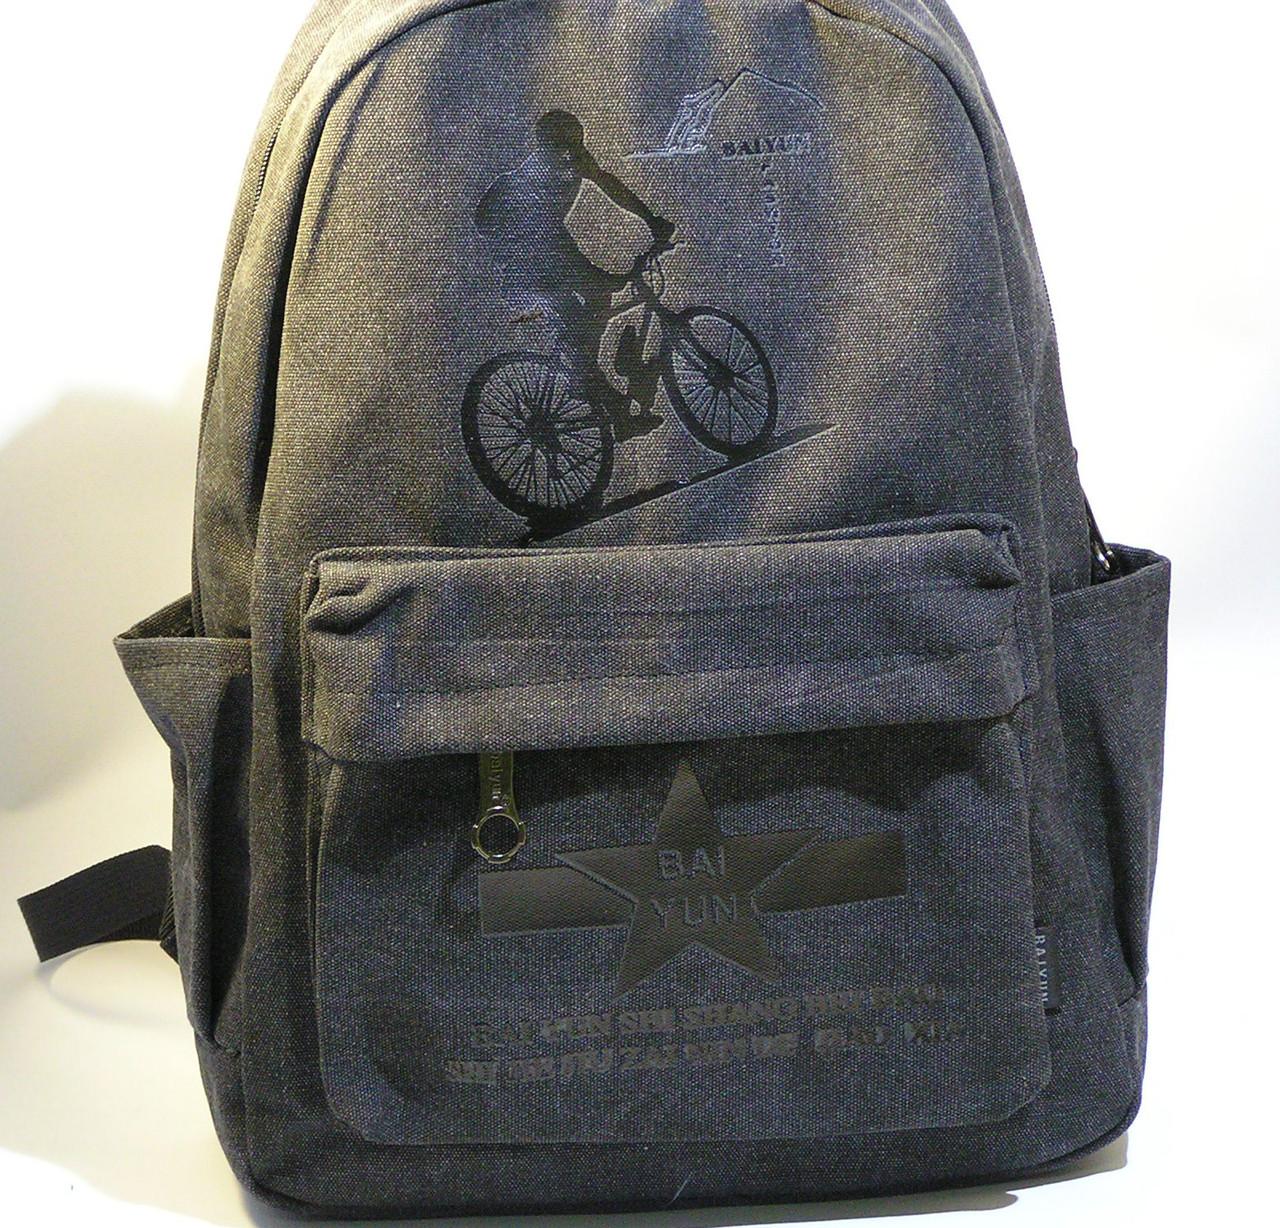 f4bb170e3e0d Городской рюкзак. Модный рюкзак. Недорогой рюкзак. Купить рюкзак ...